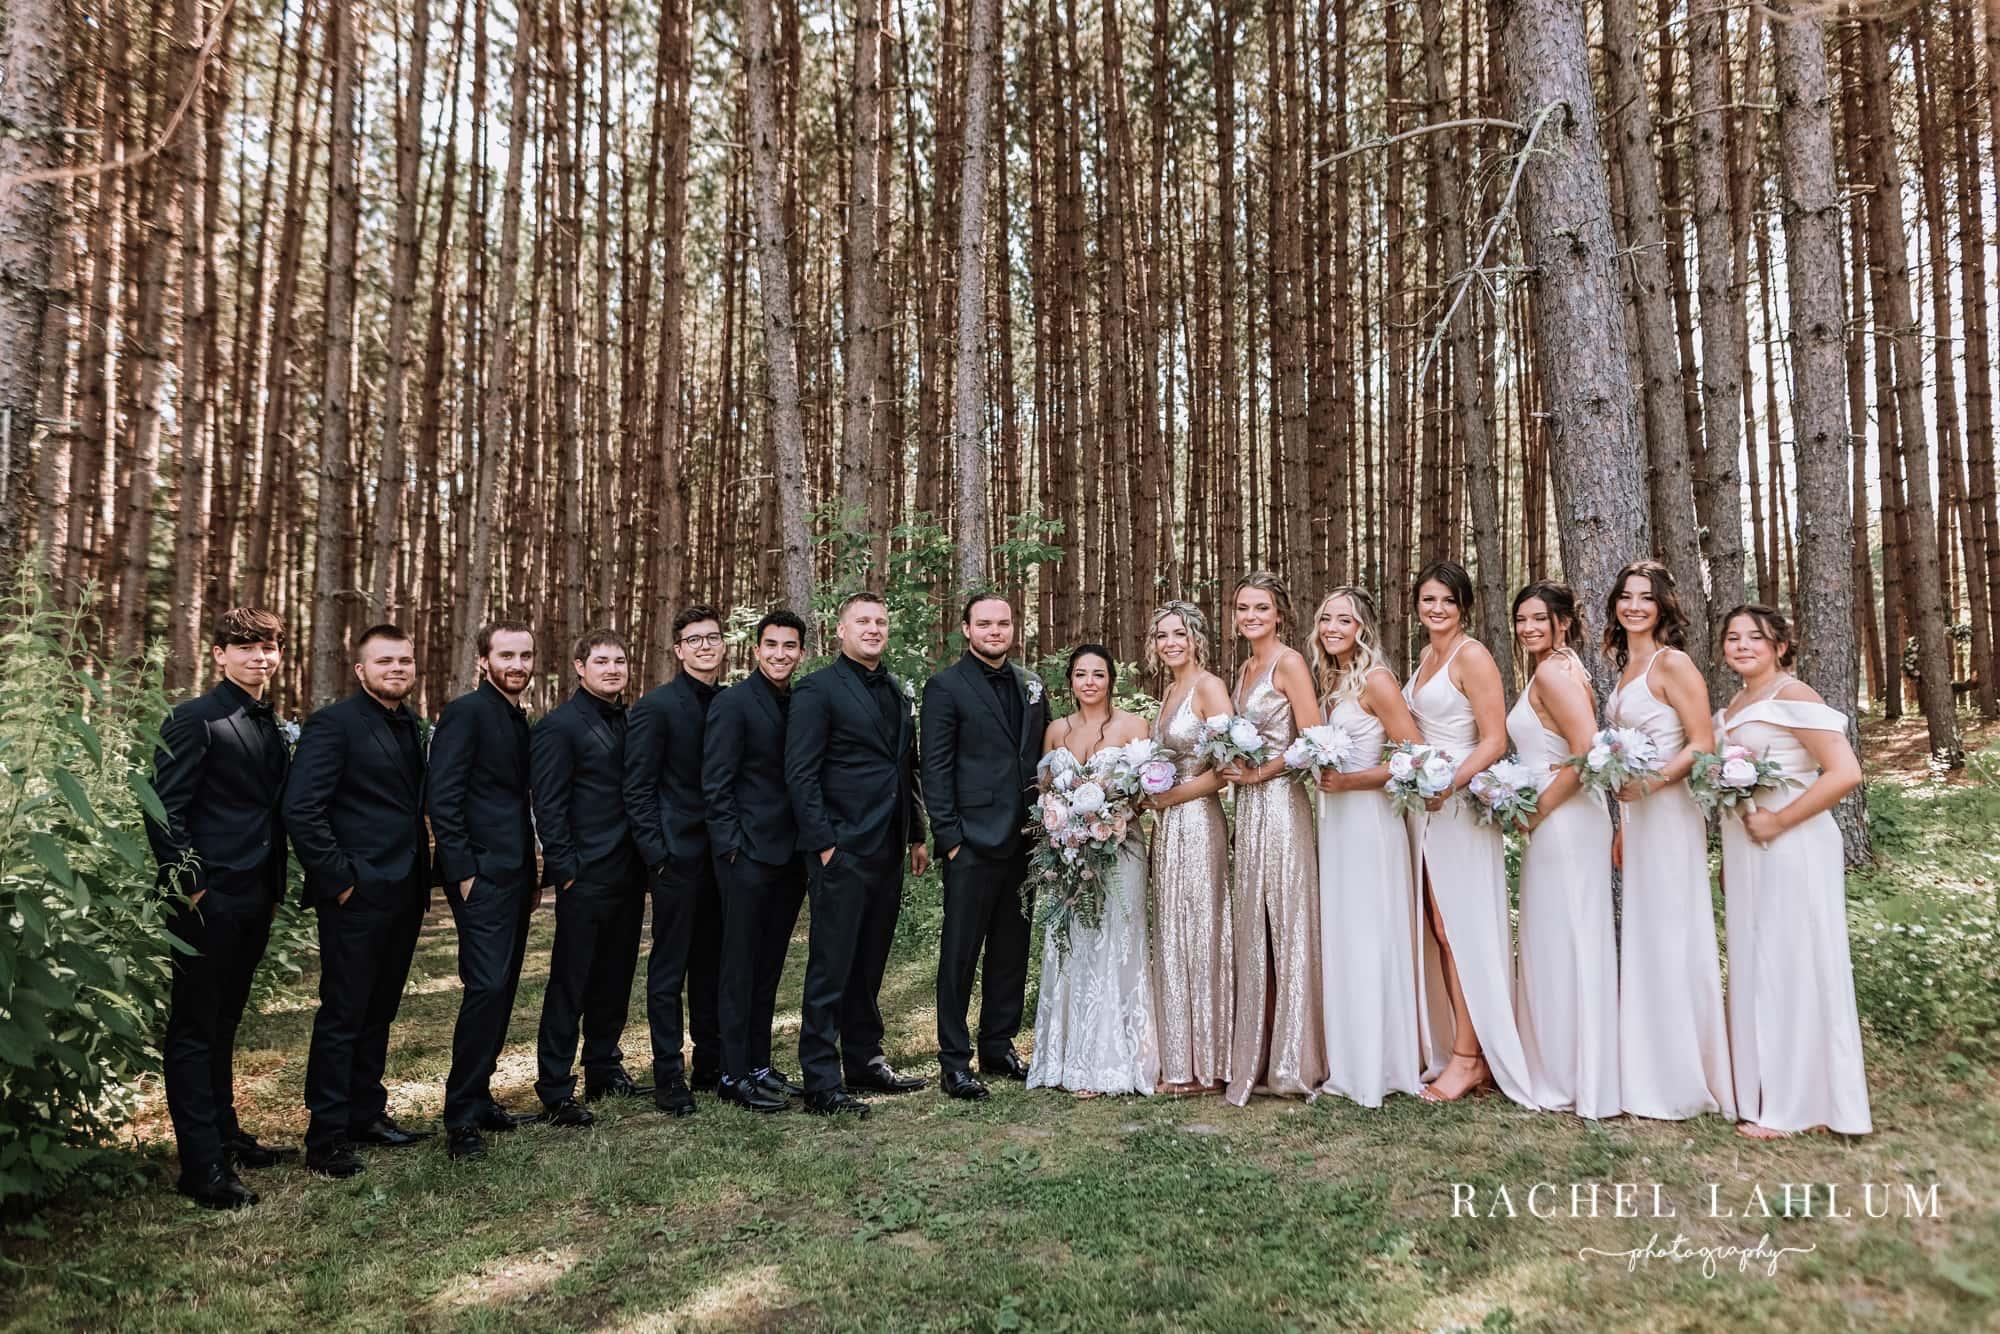 Bride, bridesmaids, groom and groomsmen pose before Olivia and Carter's wedding.